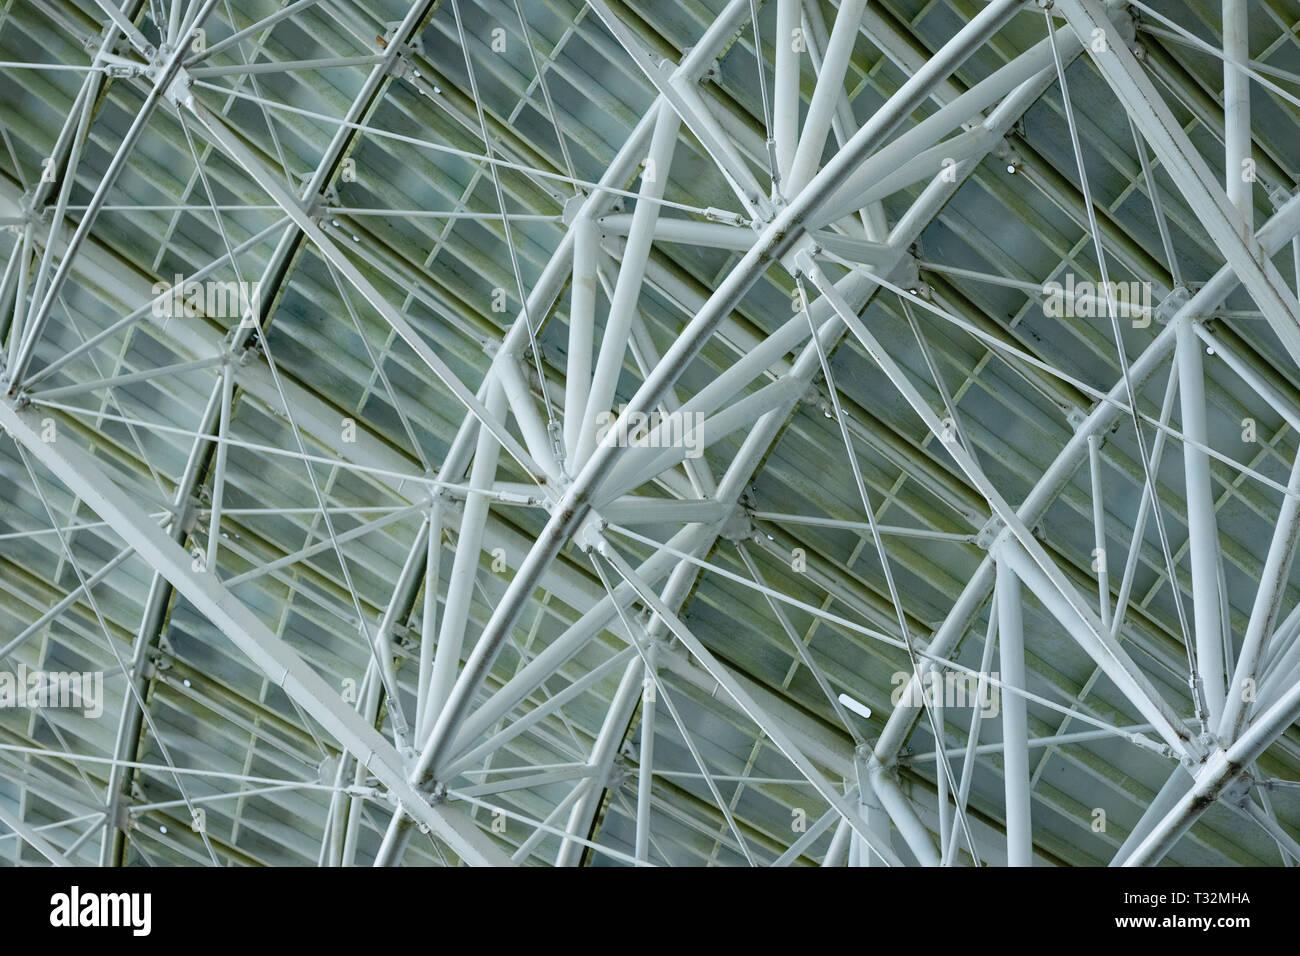 Huge white radio satellite dish close up shot. - Stock Image